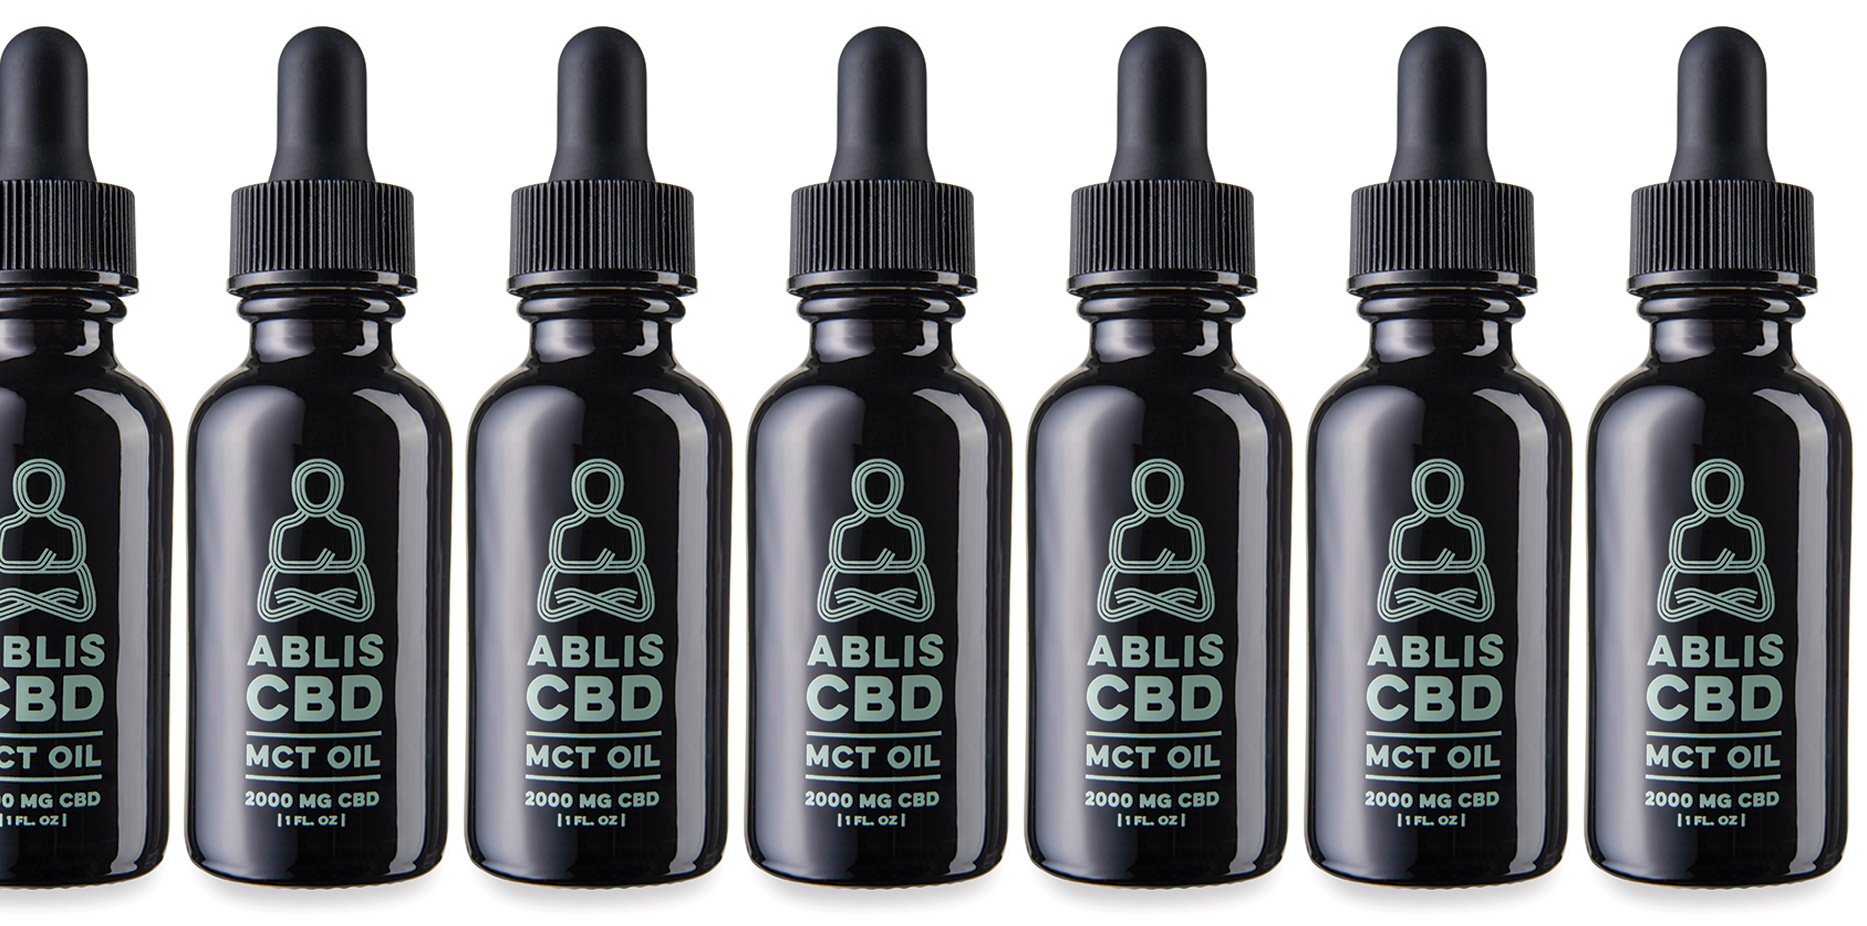 Ablis CBD MCT oil